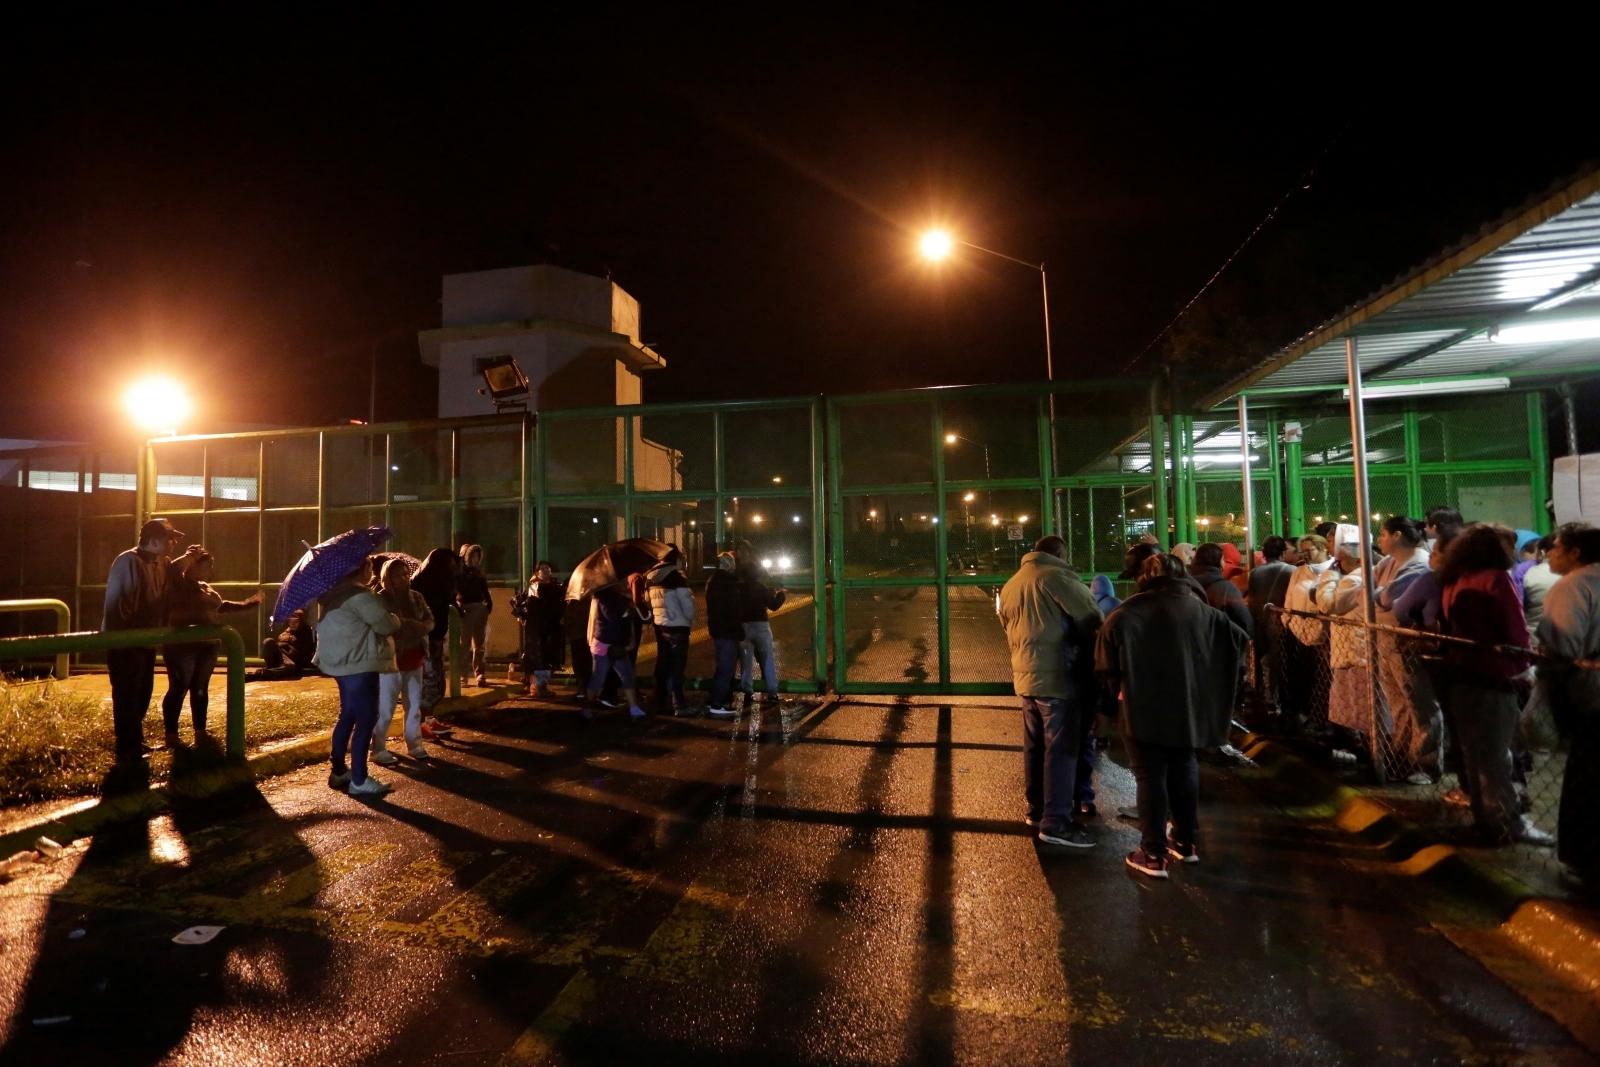 Mexico Cadereyta state prison